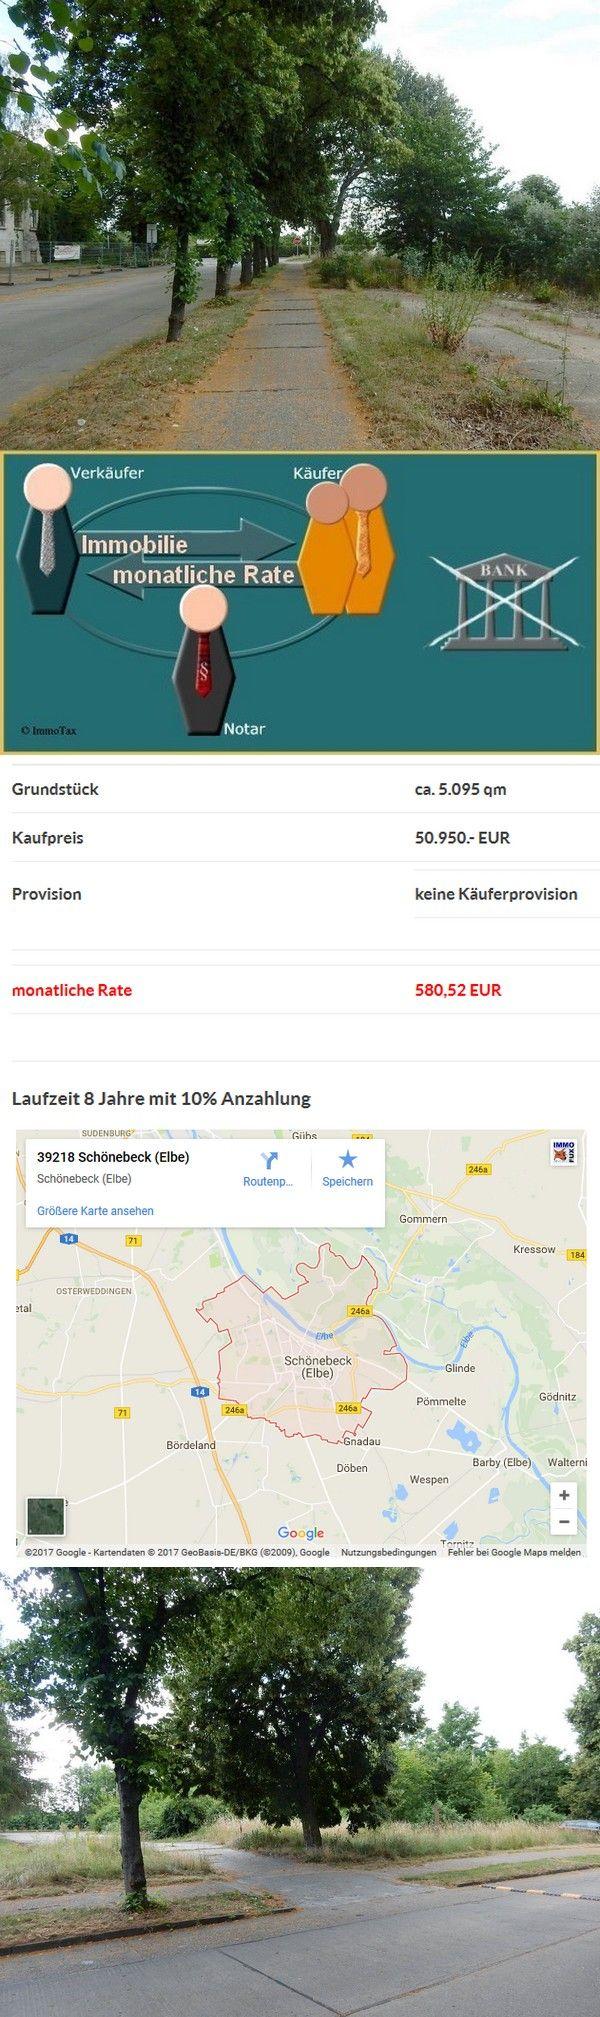 Gewerbegrundstück in 39218 Schönebeck (Elbe) zu verkaufen -->  http://mietkauf-immo.de/immobilienportal/top-angebote/?artid=14619 #Mietkauf #Ratenkauf #Immobilien #Verkauf #Grundstück #Gewerbegrundstück #Schönebeck #Magdeburg